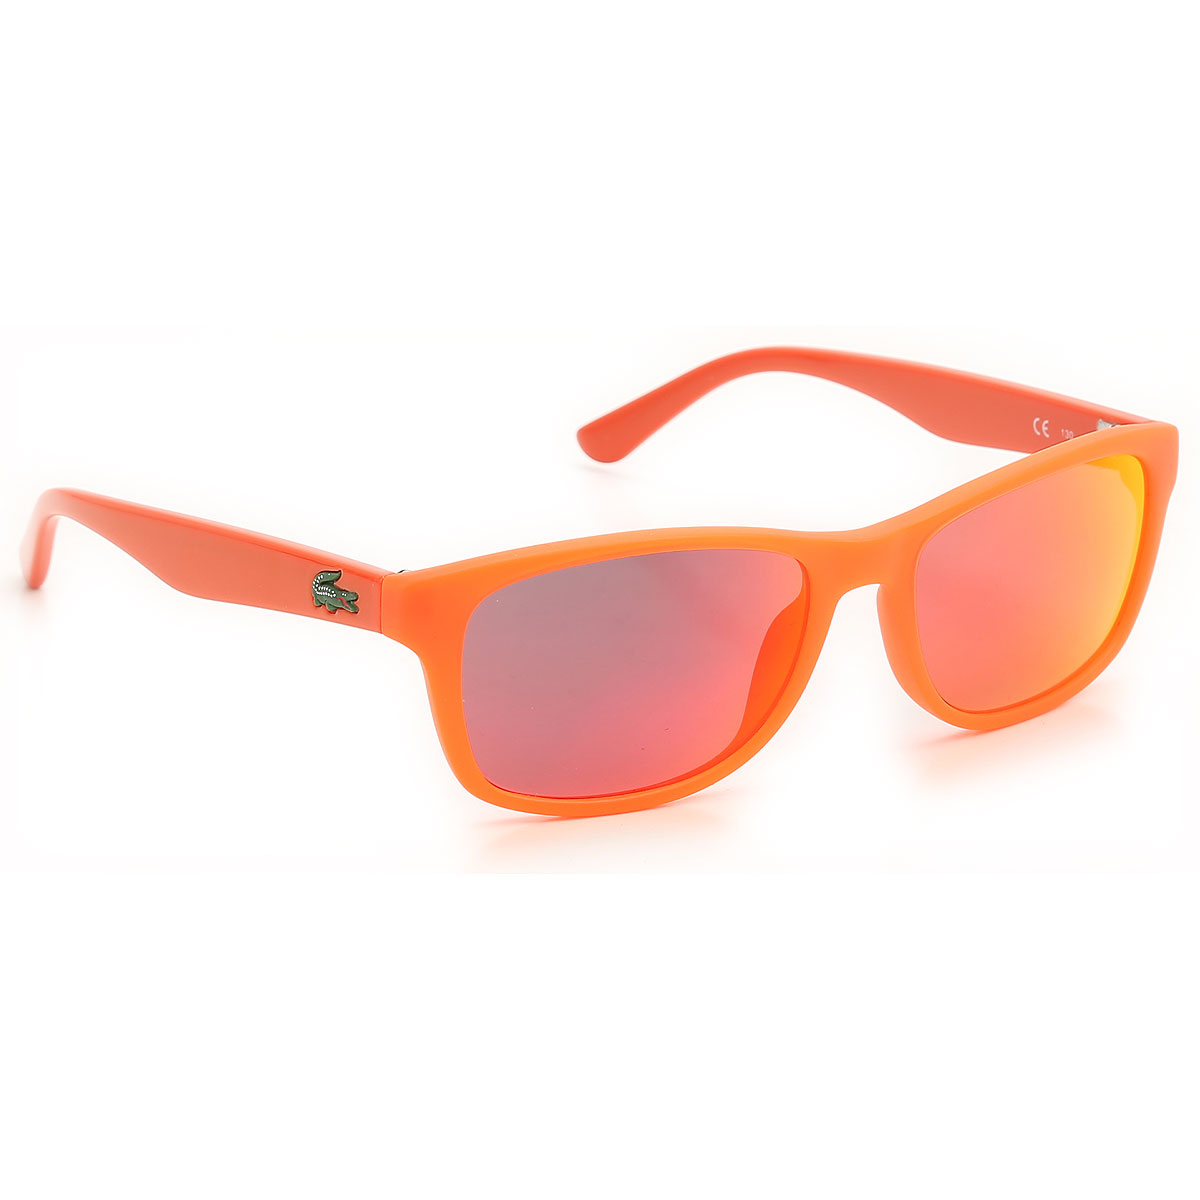 Image of Lacoste Kids Sunglasses for Boys On Sale, Matt Fluo Orange, 2017